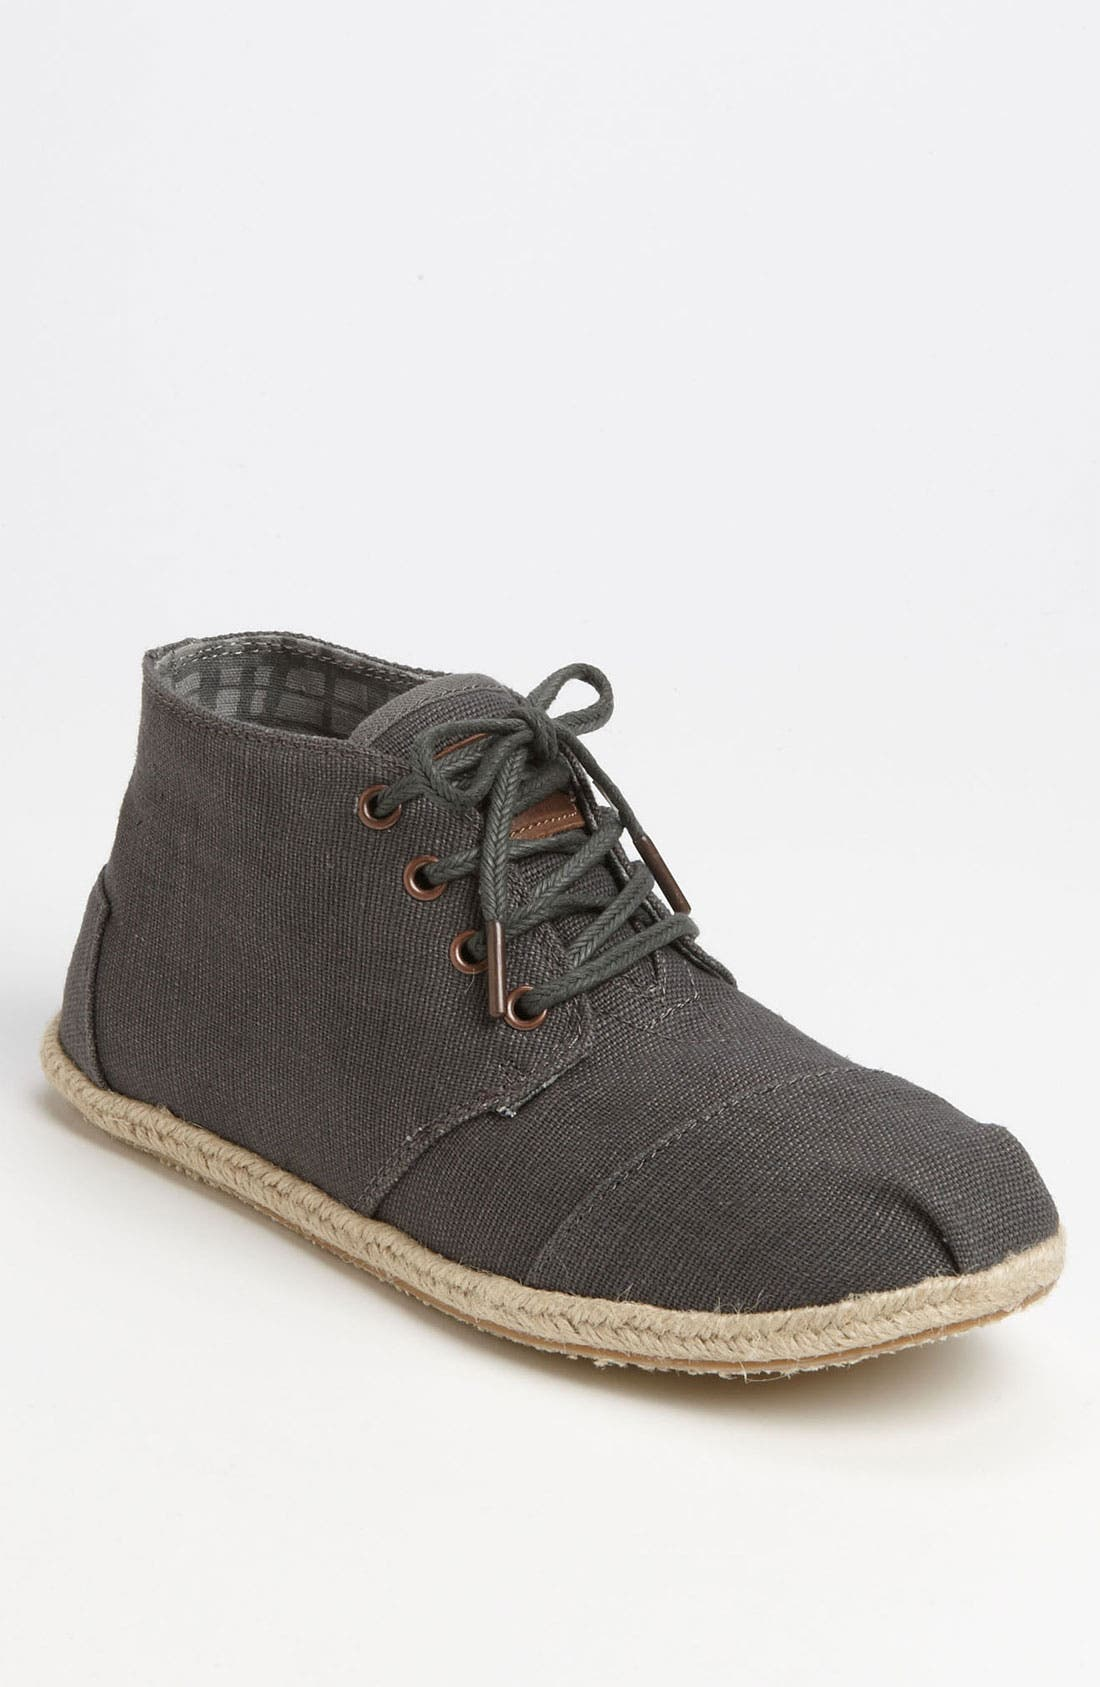 Main Image - TOMS 'Botas - Desert' Burlap Chukka Boot (Men)